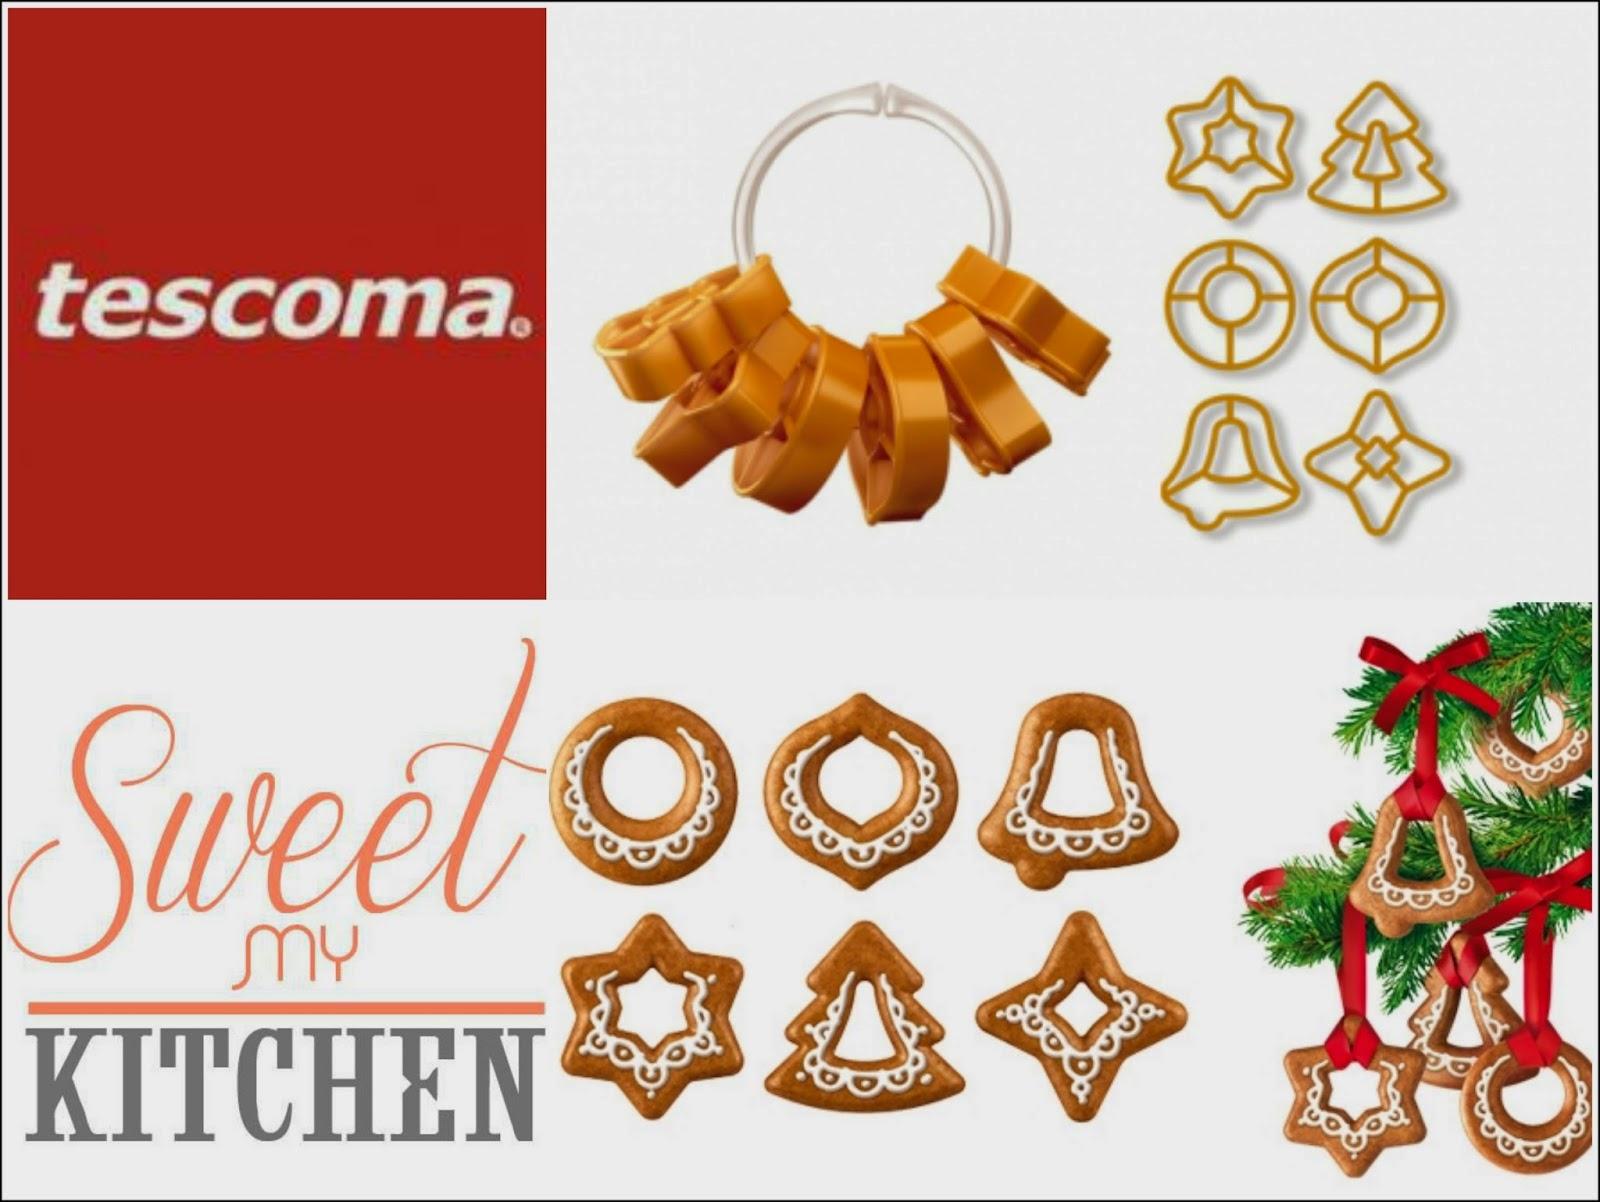 http://www.sweetmykitchen.com/2014/12/passatempo-de-natal-tescoma.html